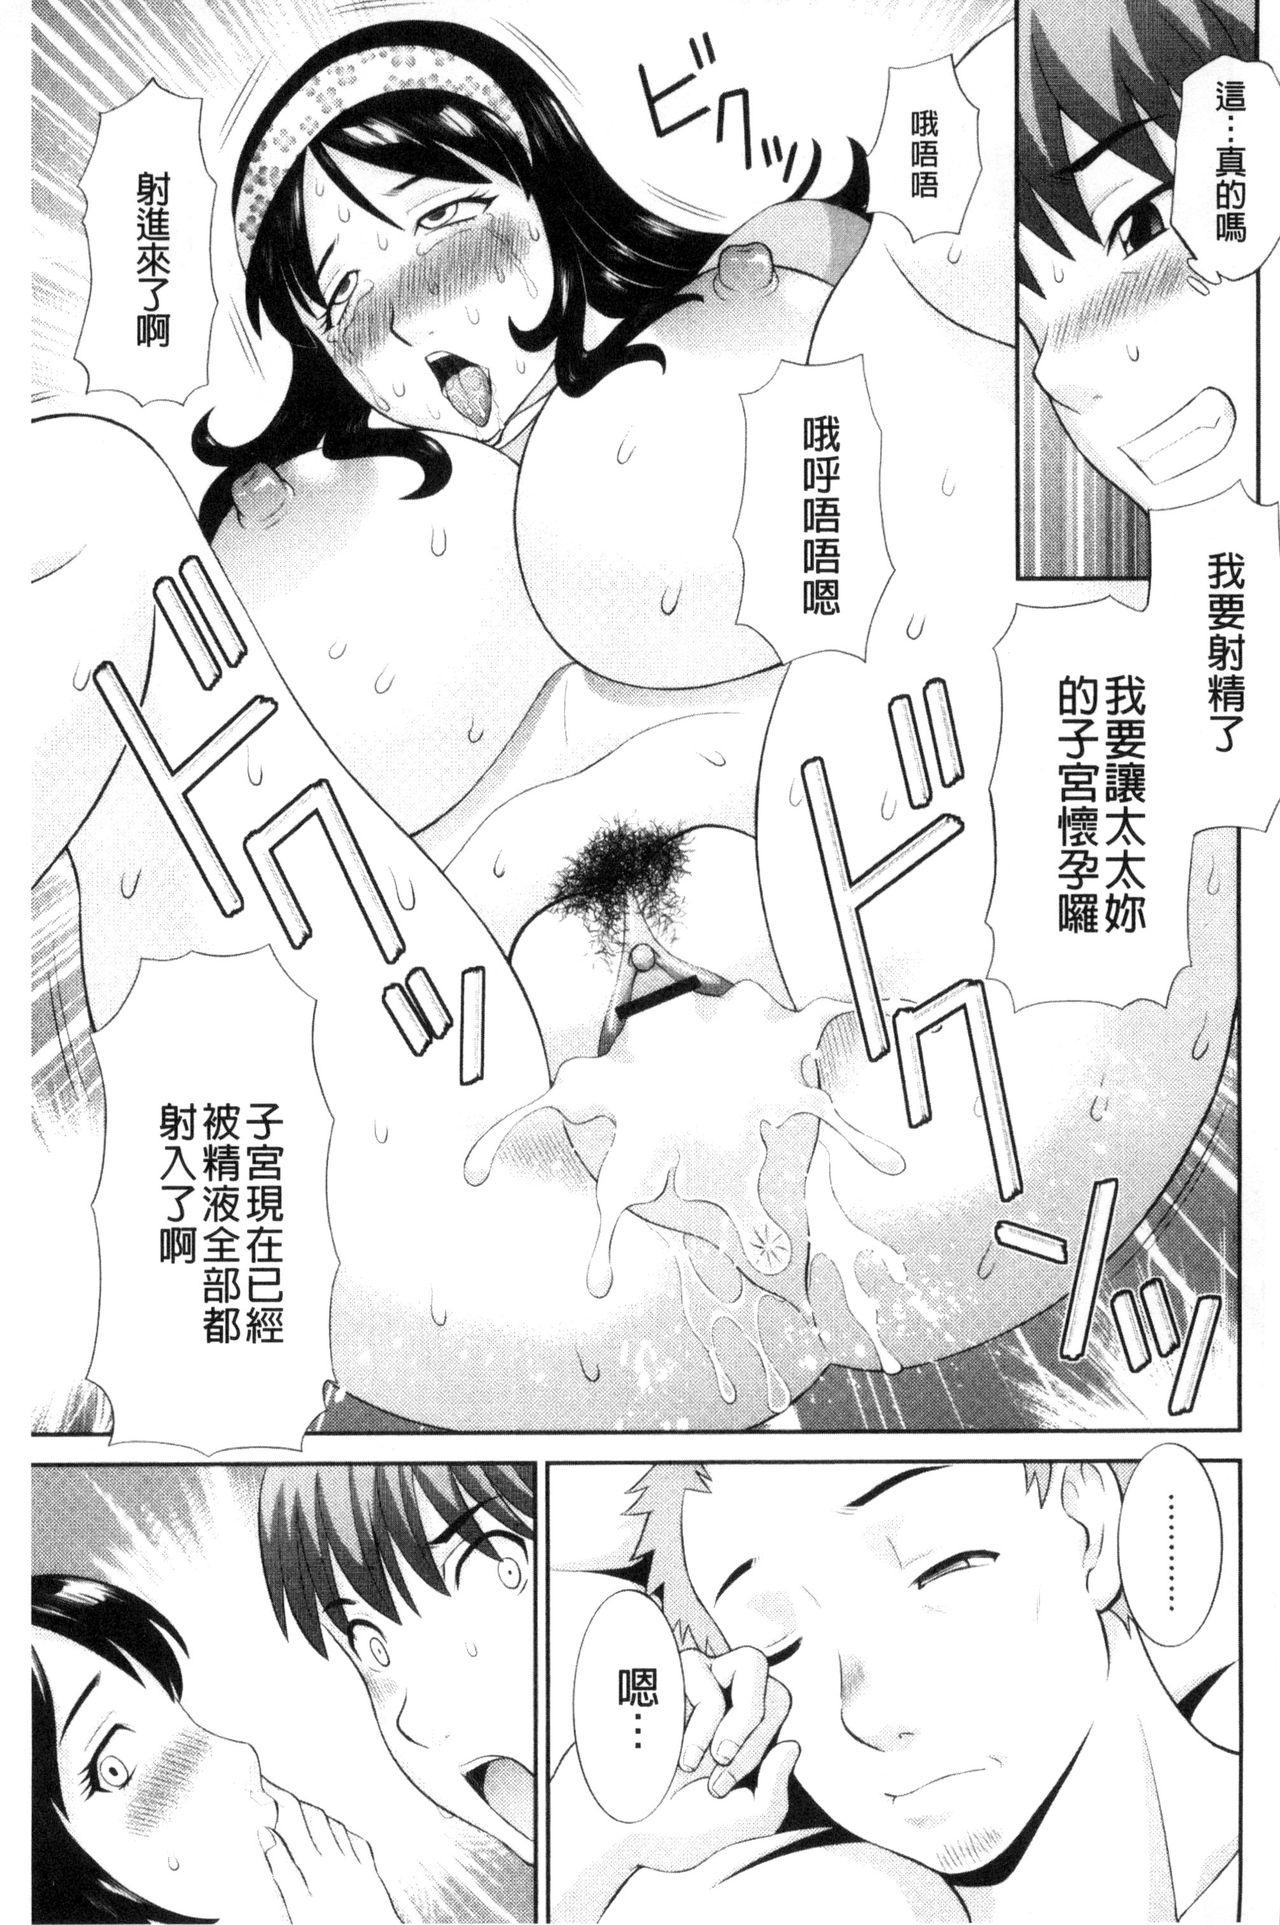 Haramase! Hitozuma Choukyoushi | 受孕吧!人妻調教師 190